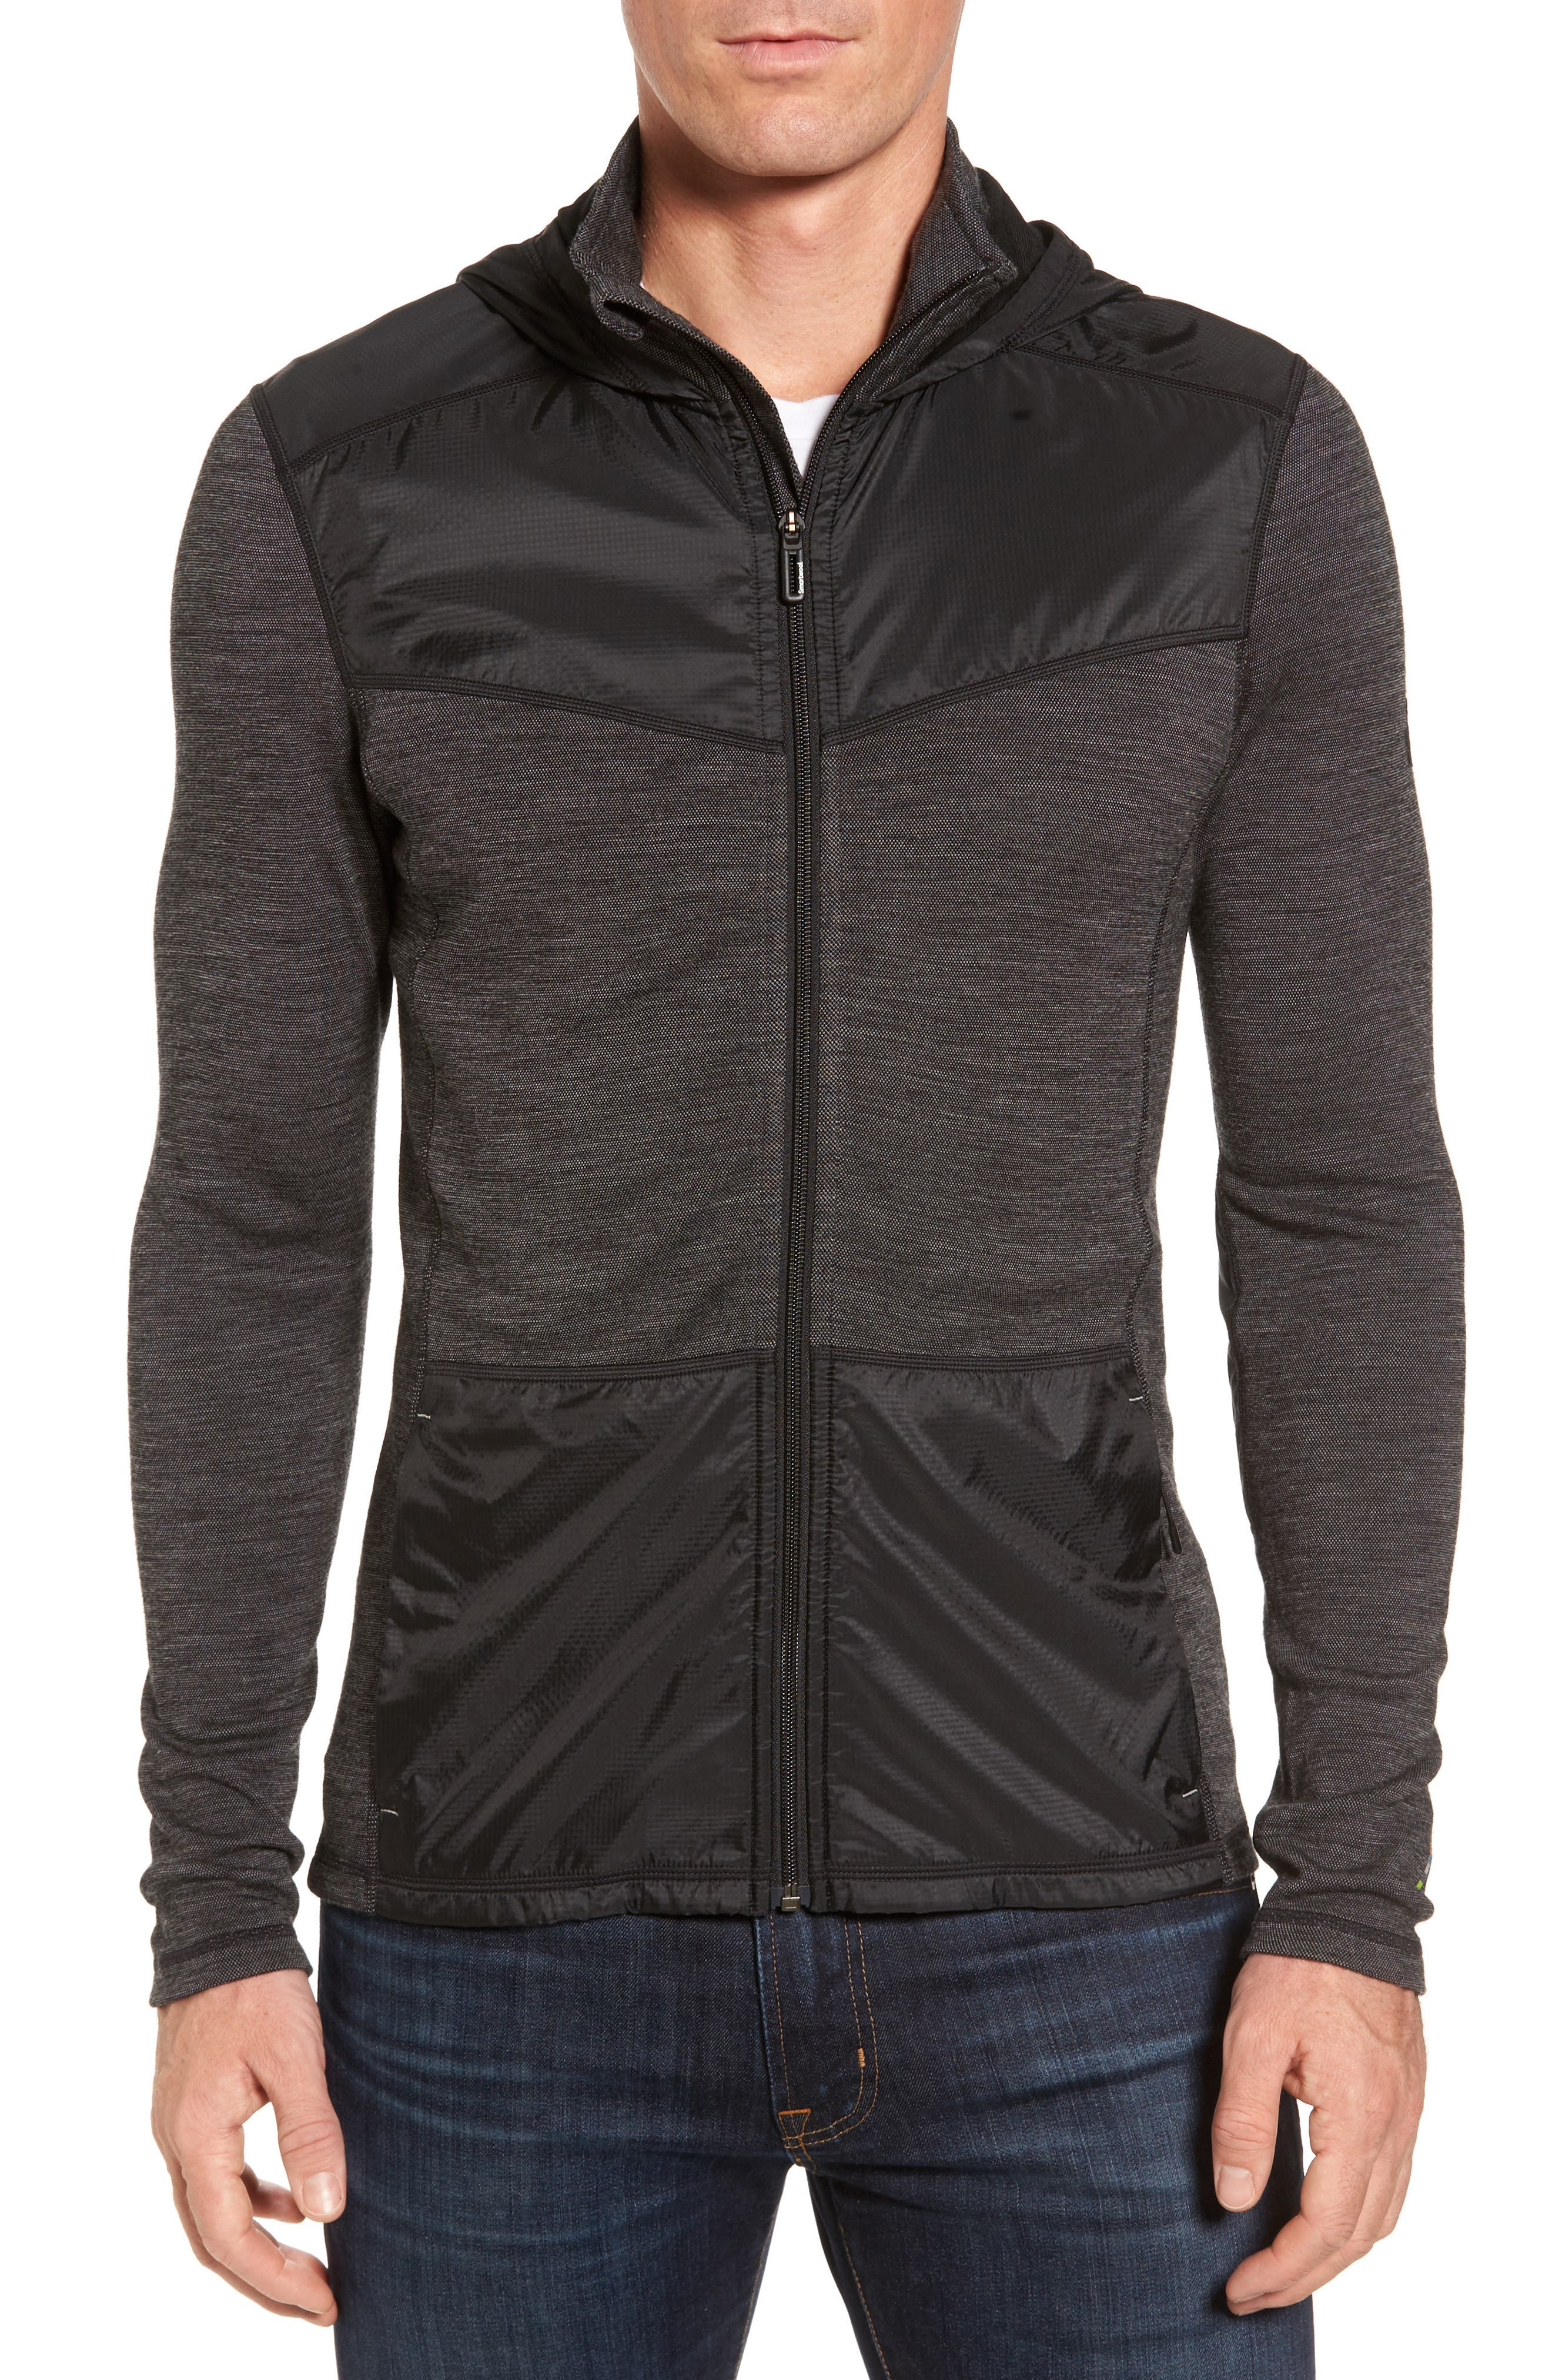 250 Sport Merino Wool Jacket,                             Main thumbnail 1, color,                             001